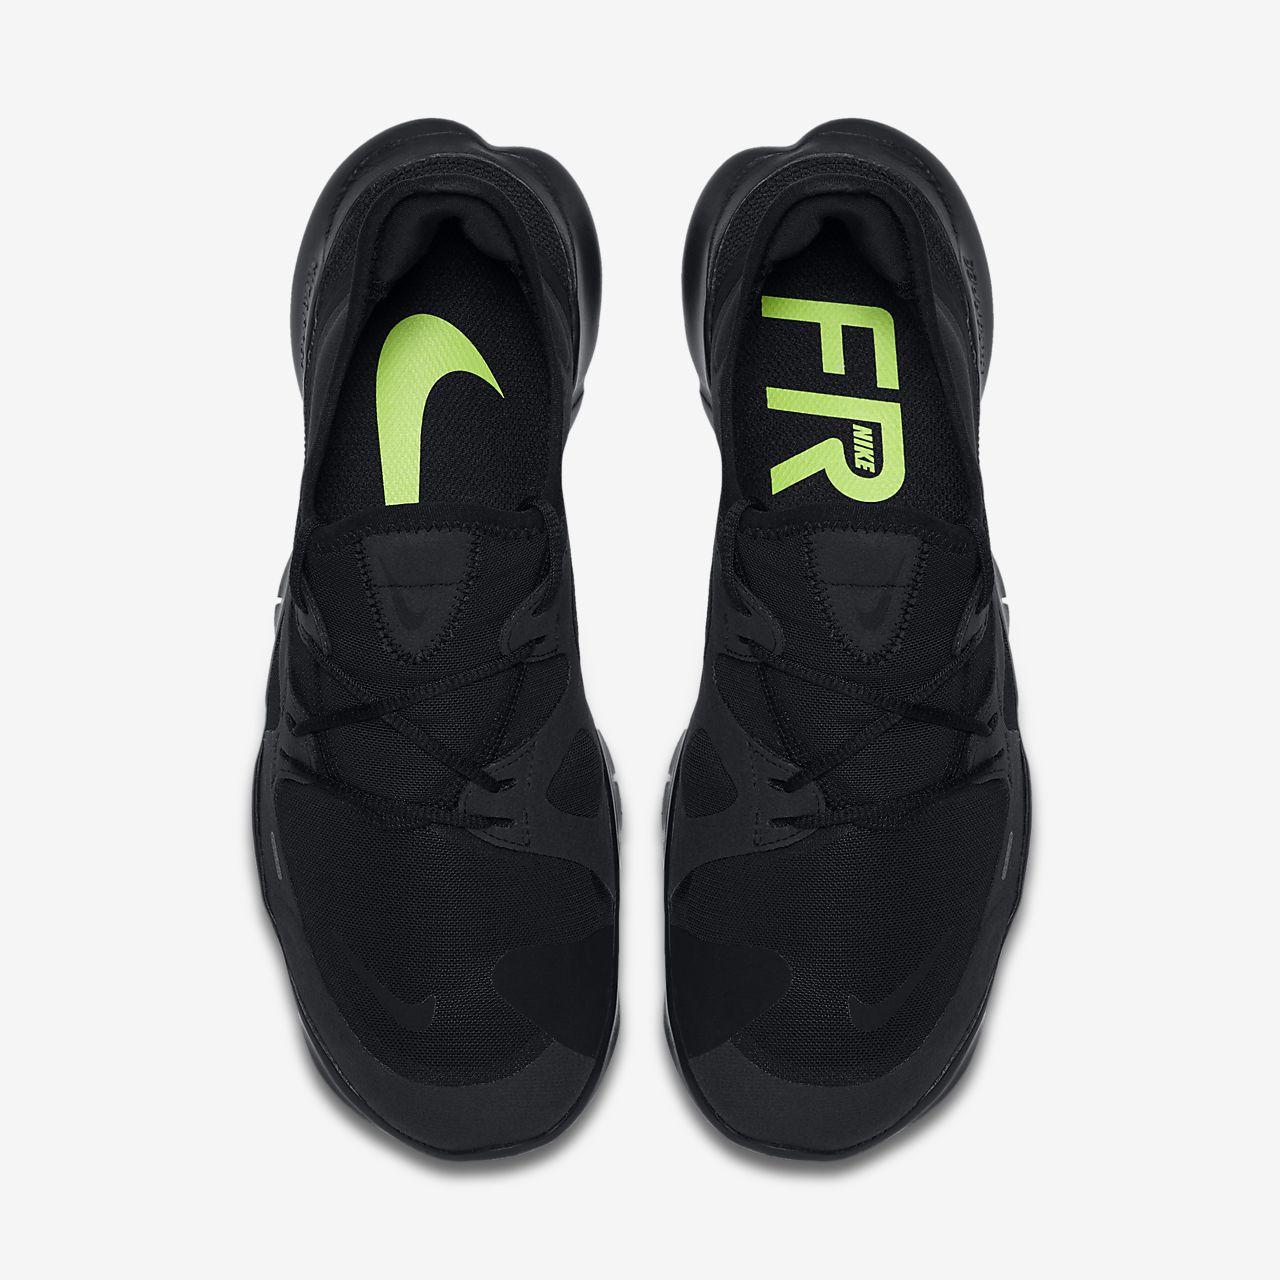 Nike Free RN 5.0 løpesko til herre